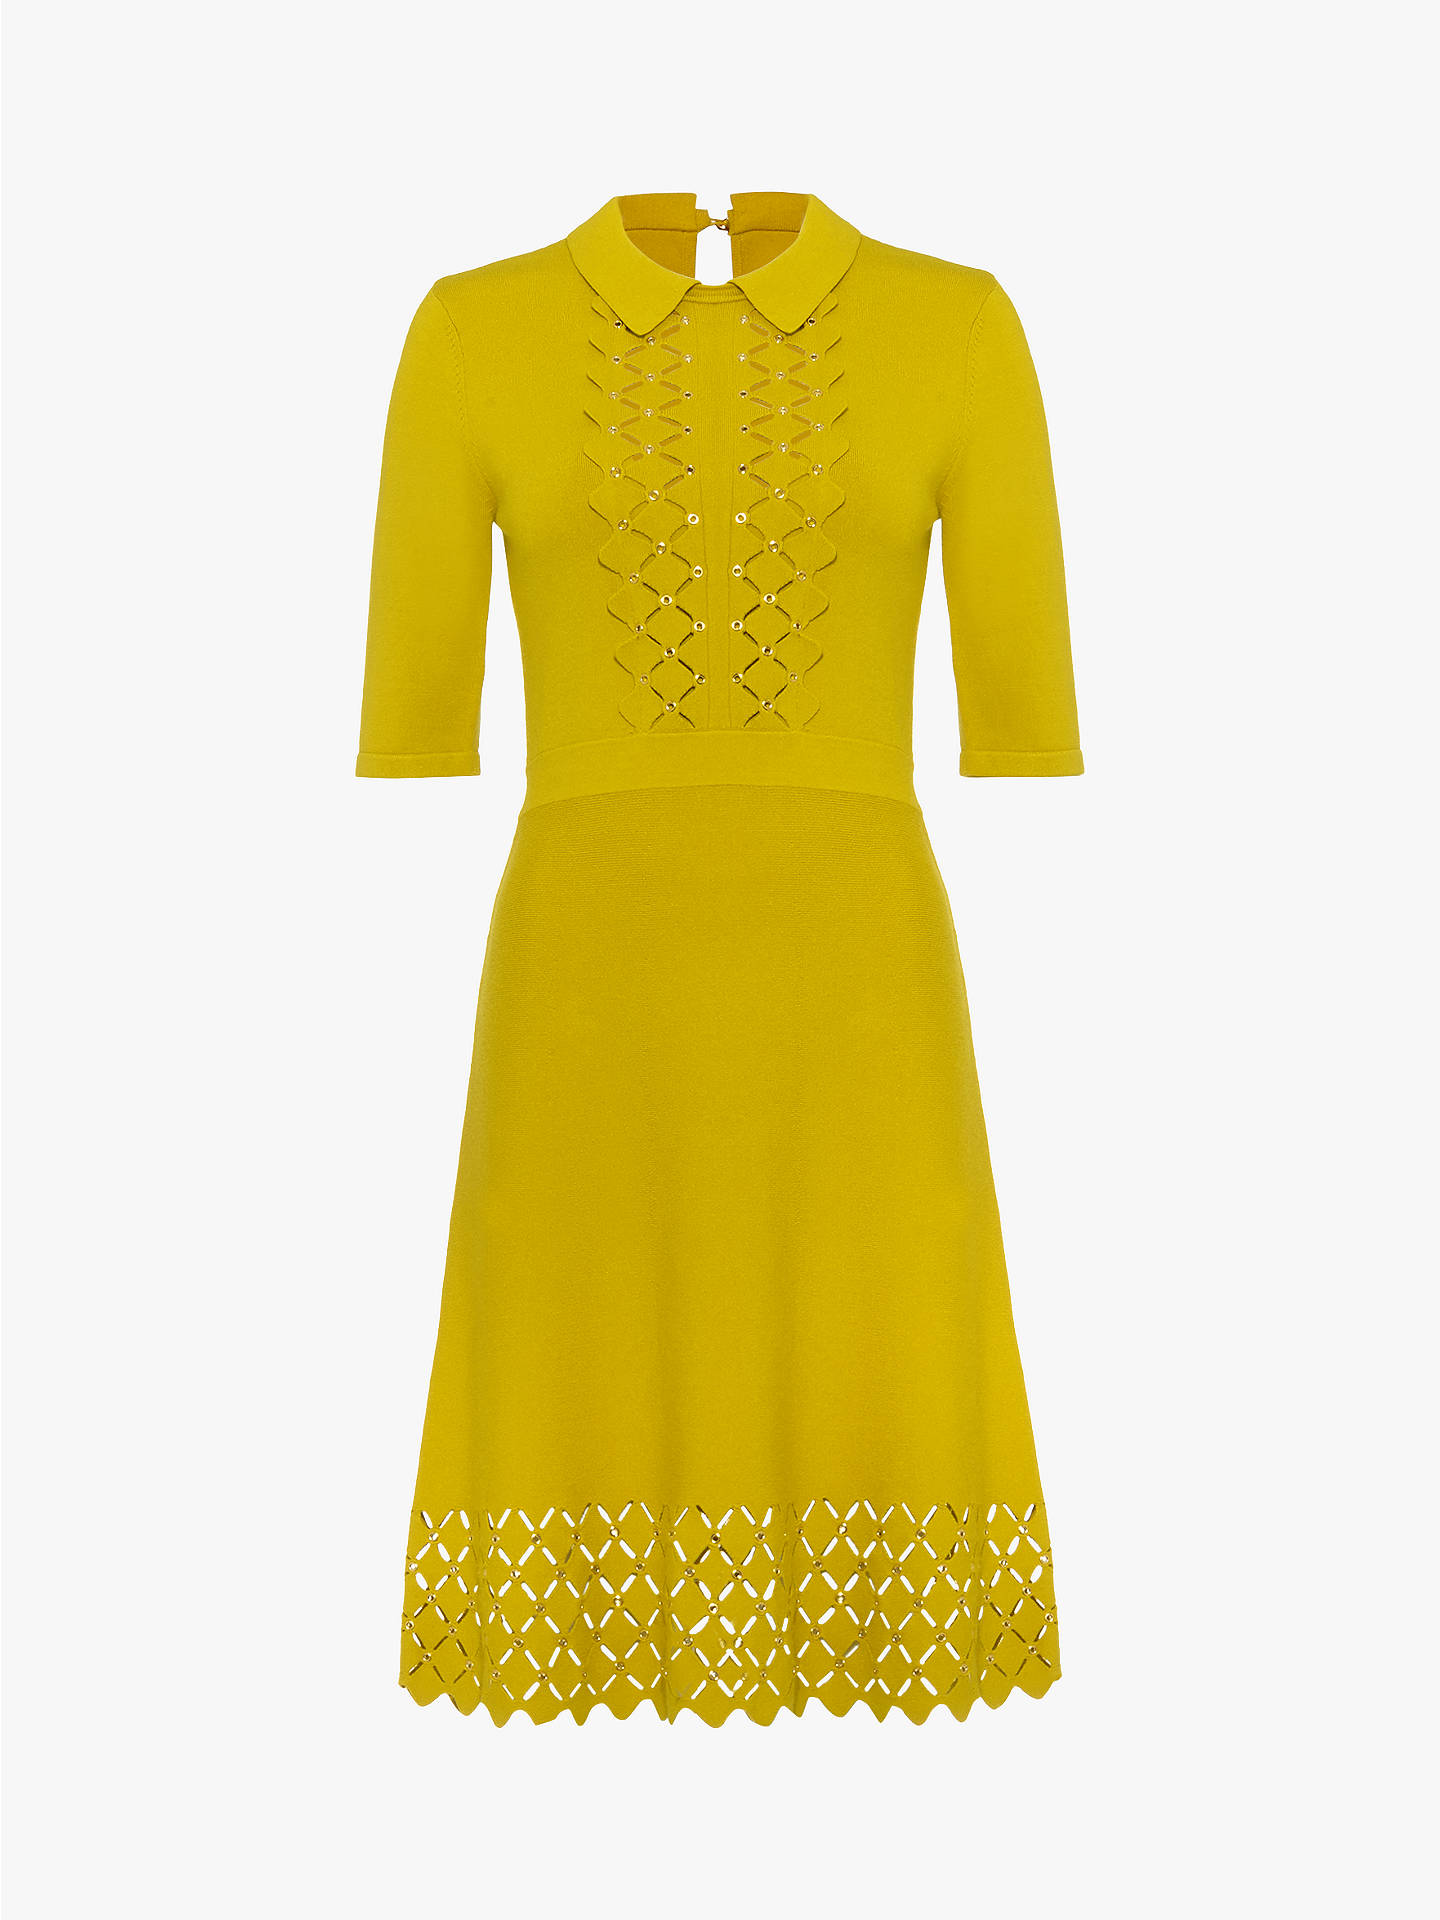 07ace8146cdf4 Damsel in a Dress Liona Diamond Stitch Dress, Mustard